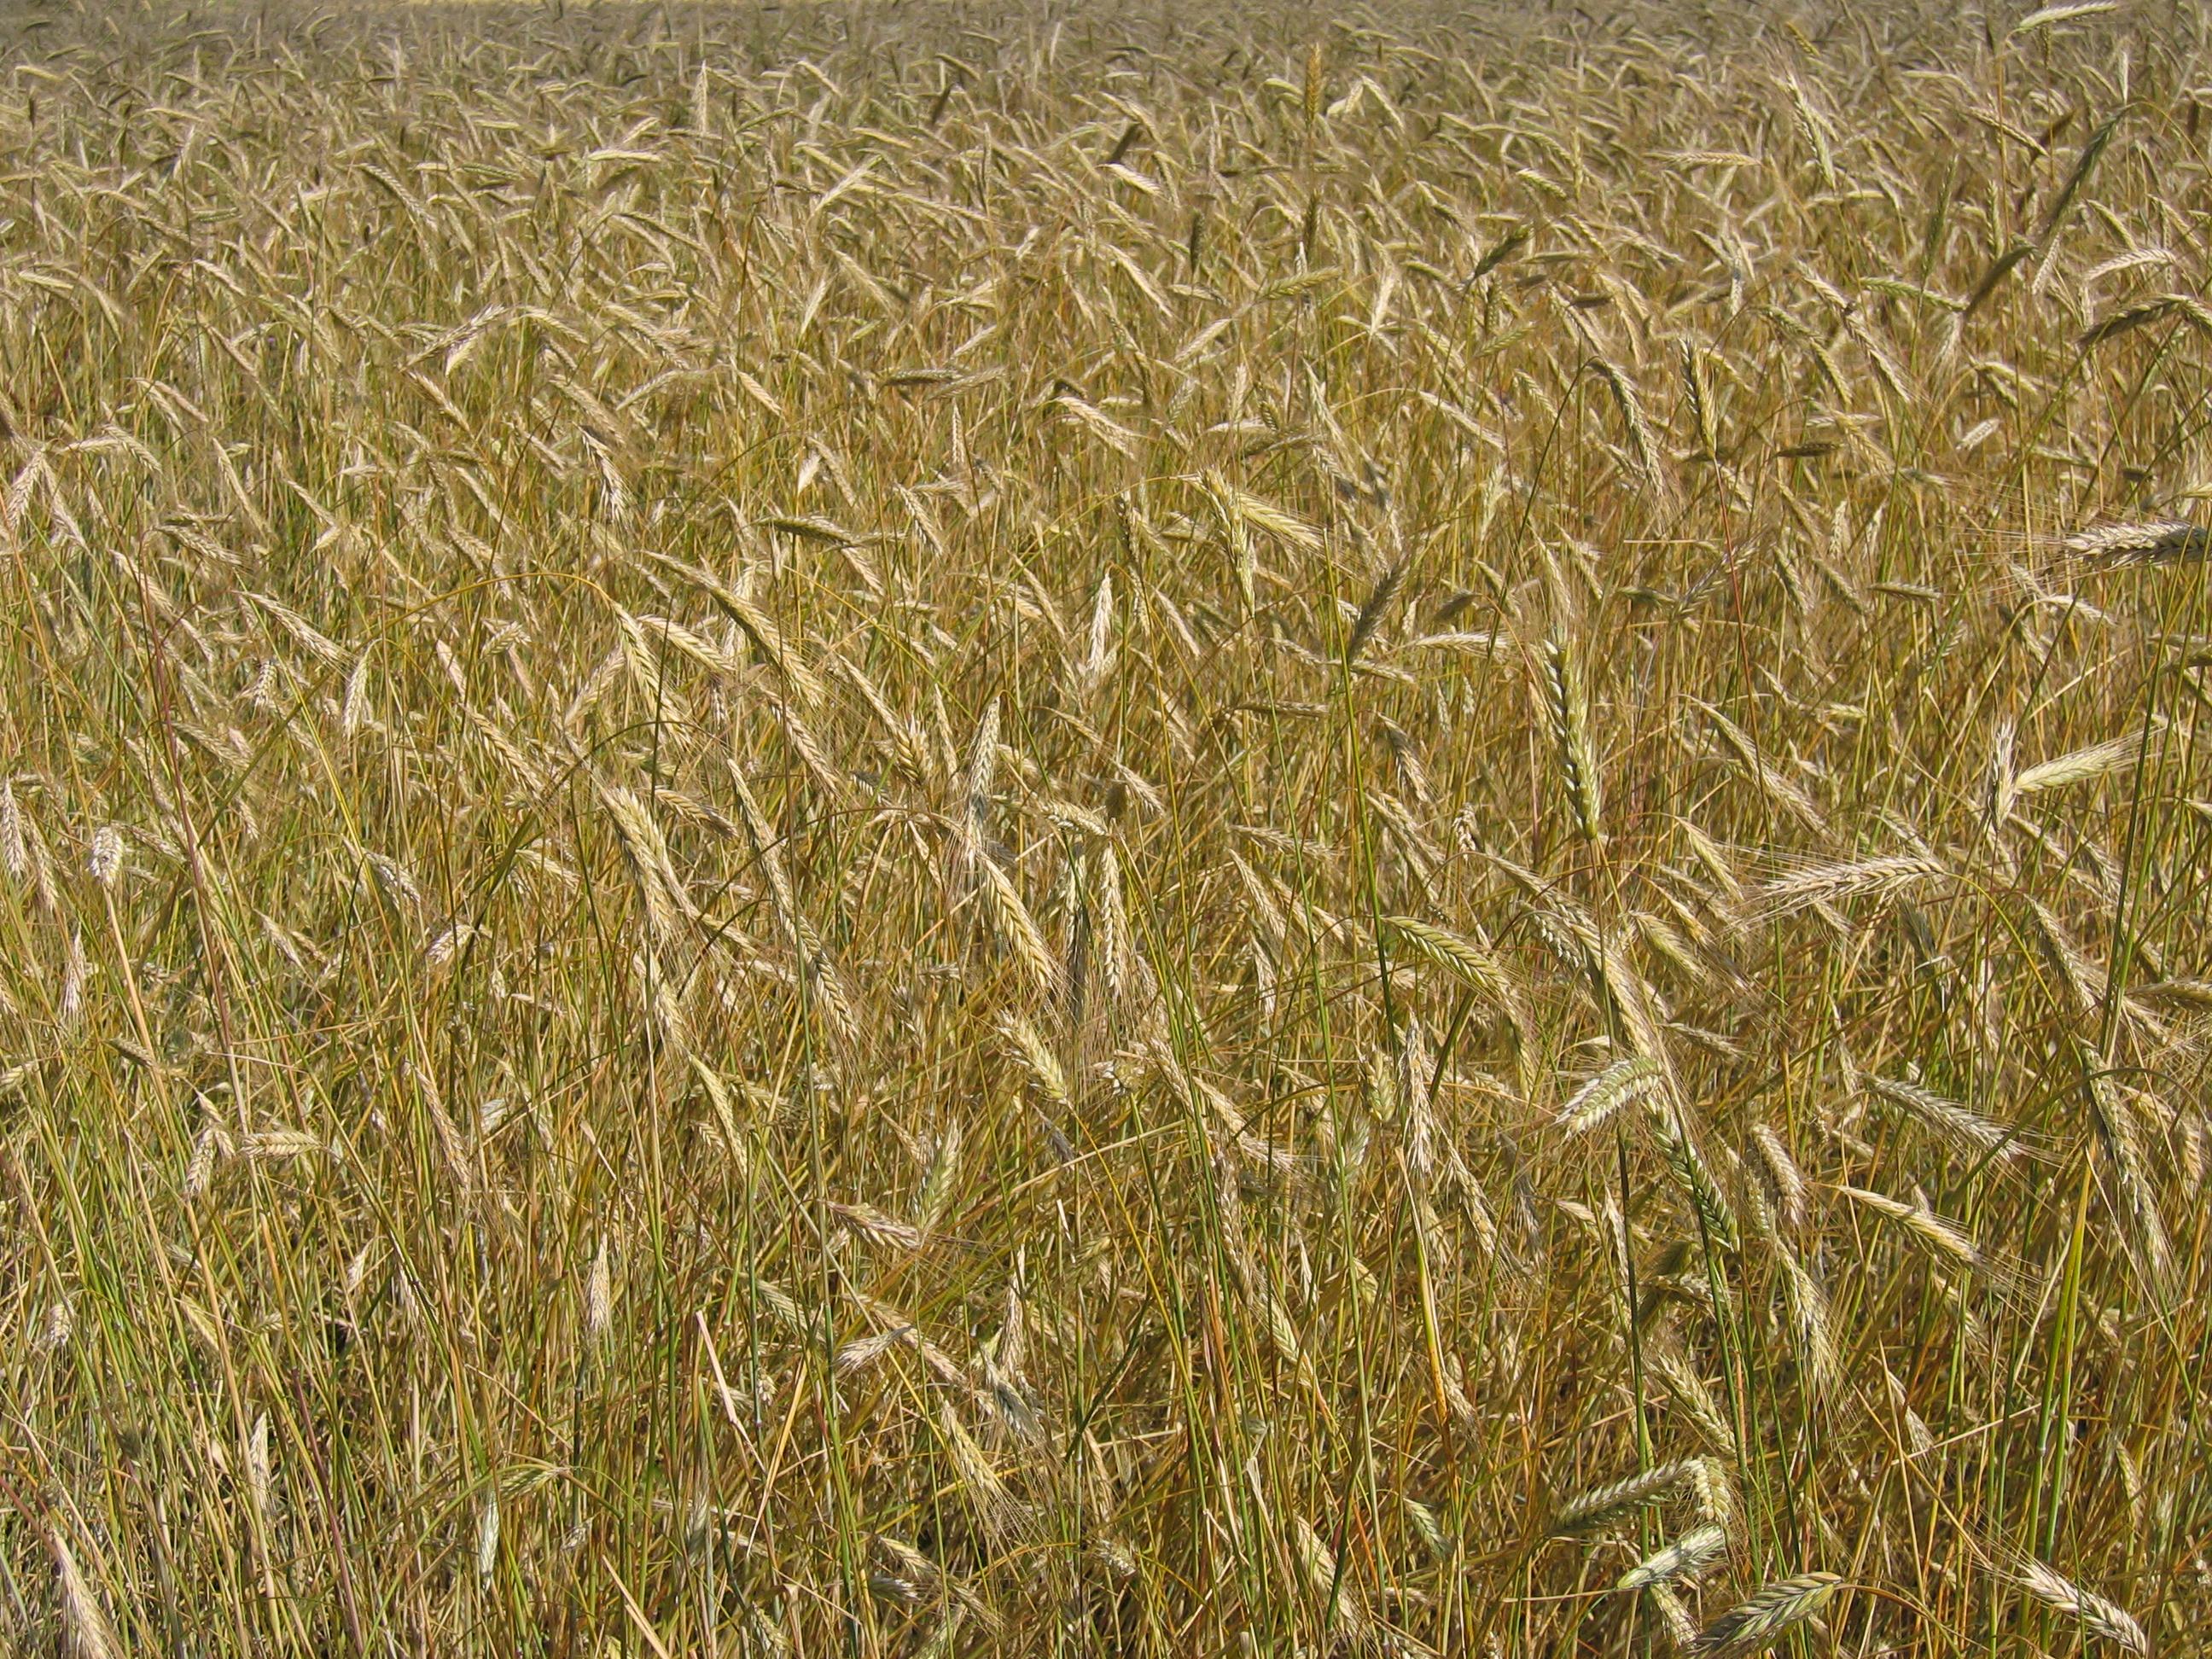 How Farm Subsidies (Mal)Function